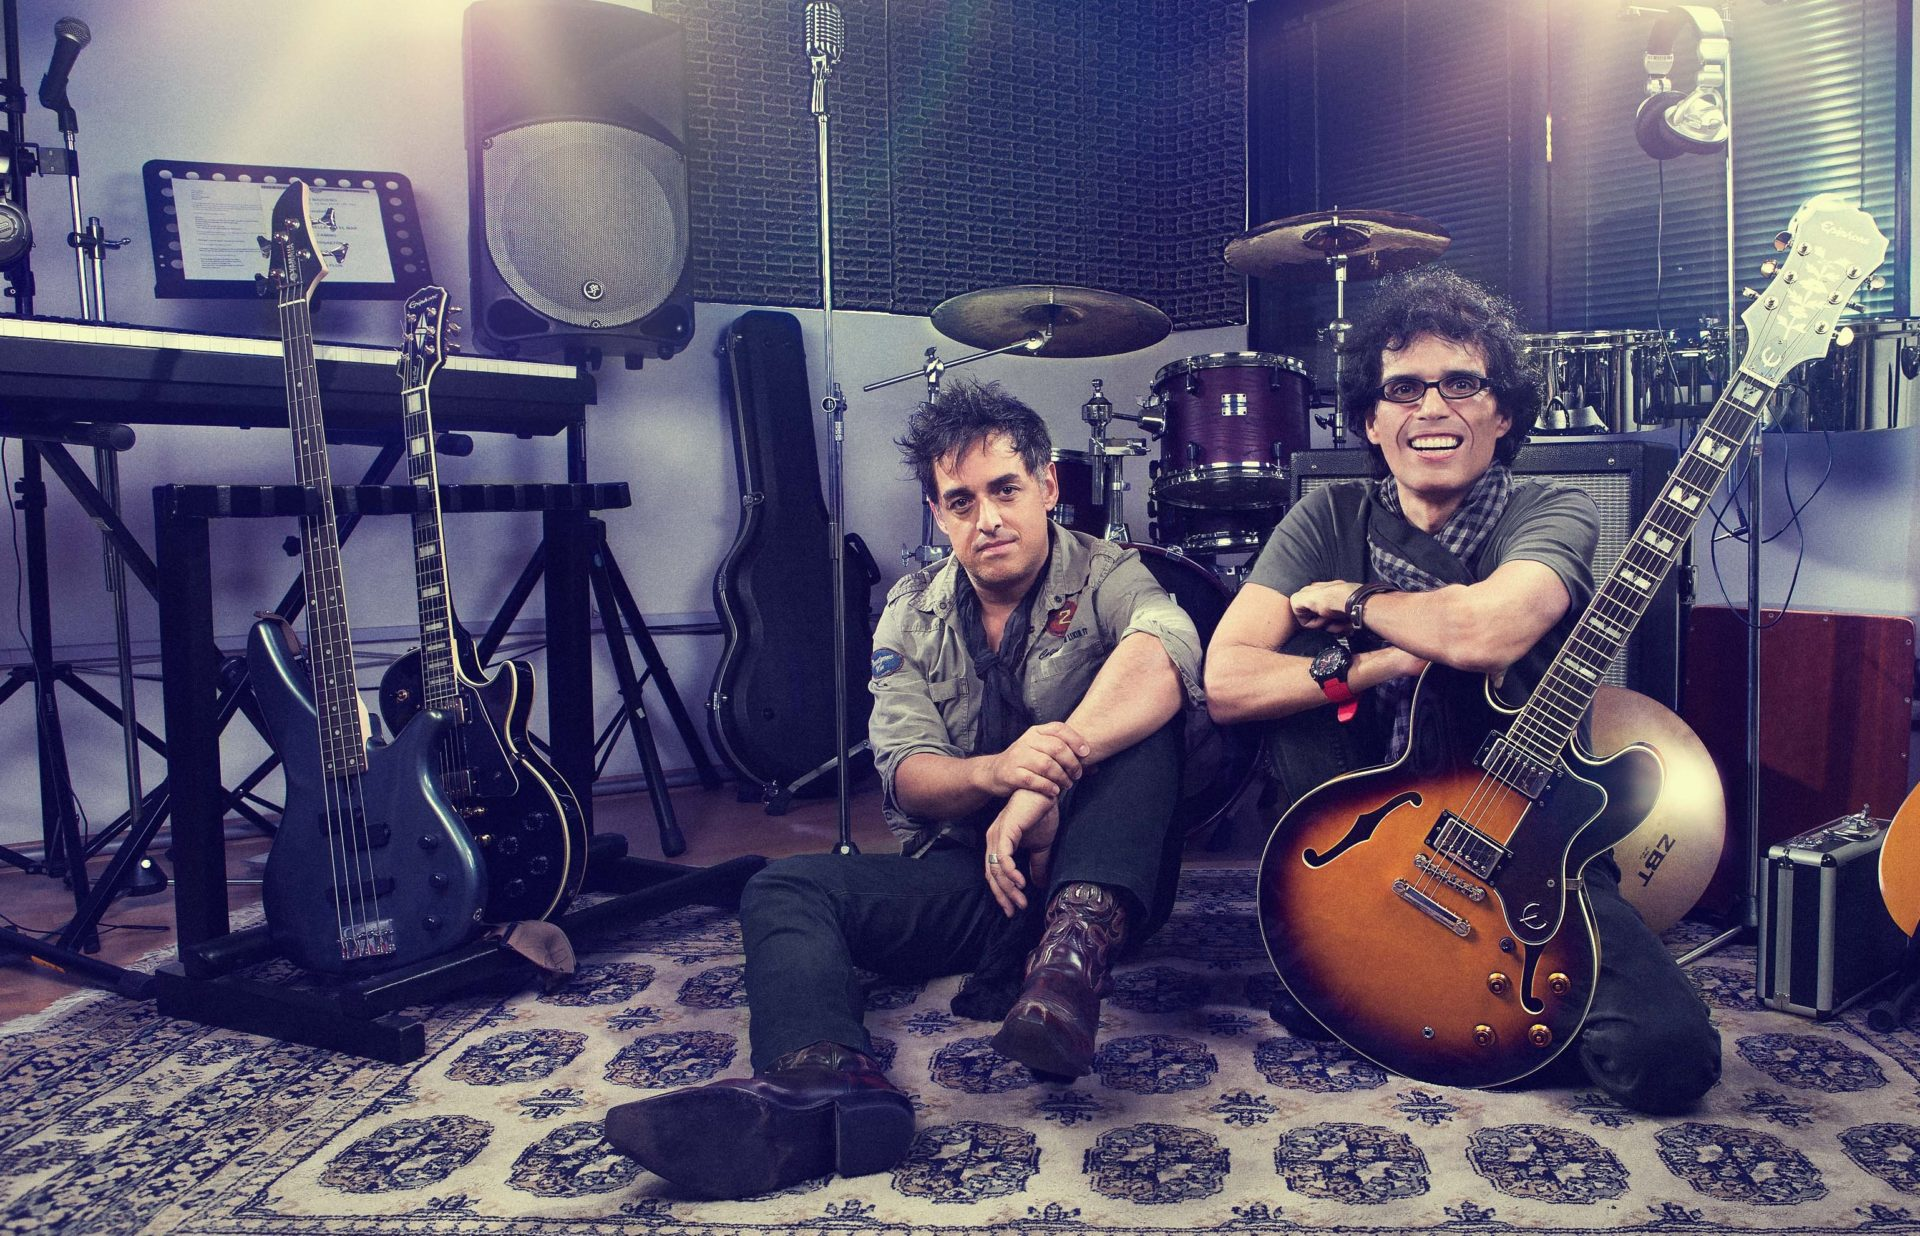 Pelo Madueño y Pedro Suárez-Vértiz seleccionan música de artistas peruanos